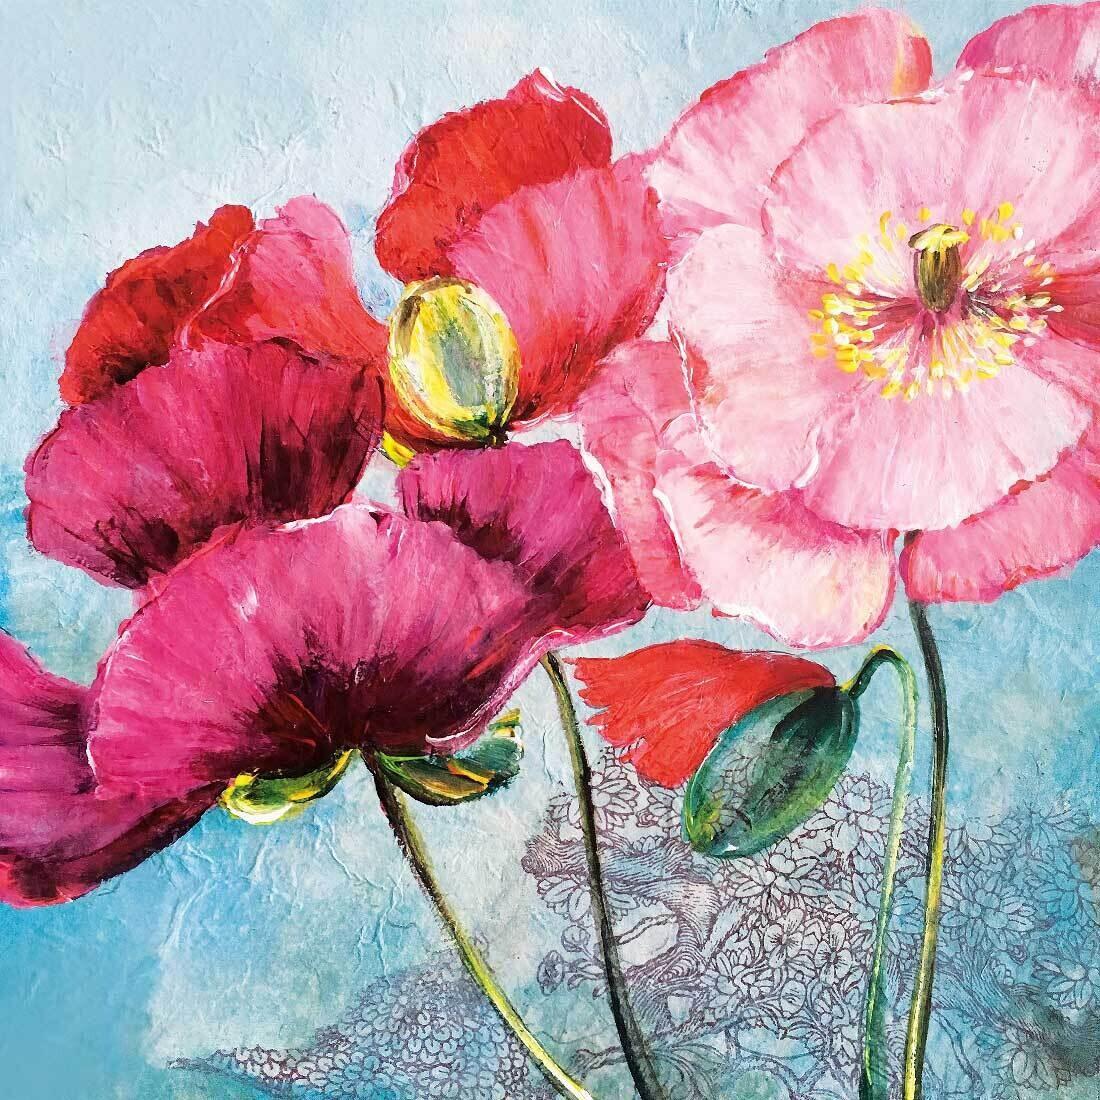 Decoupage Paper Napkins - Floral Poppy - Pavot (1 Sheet)